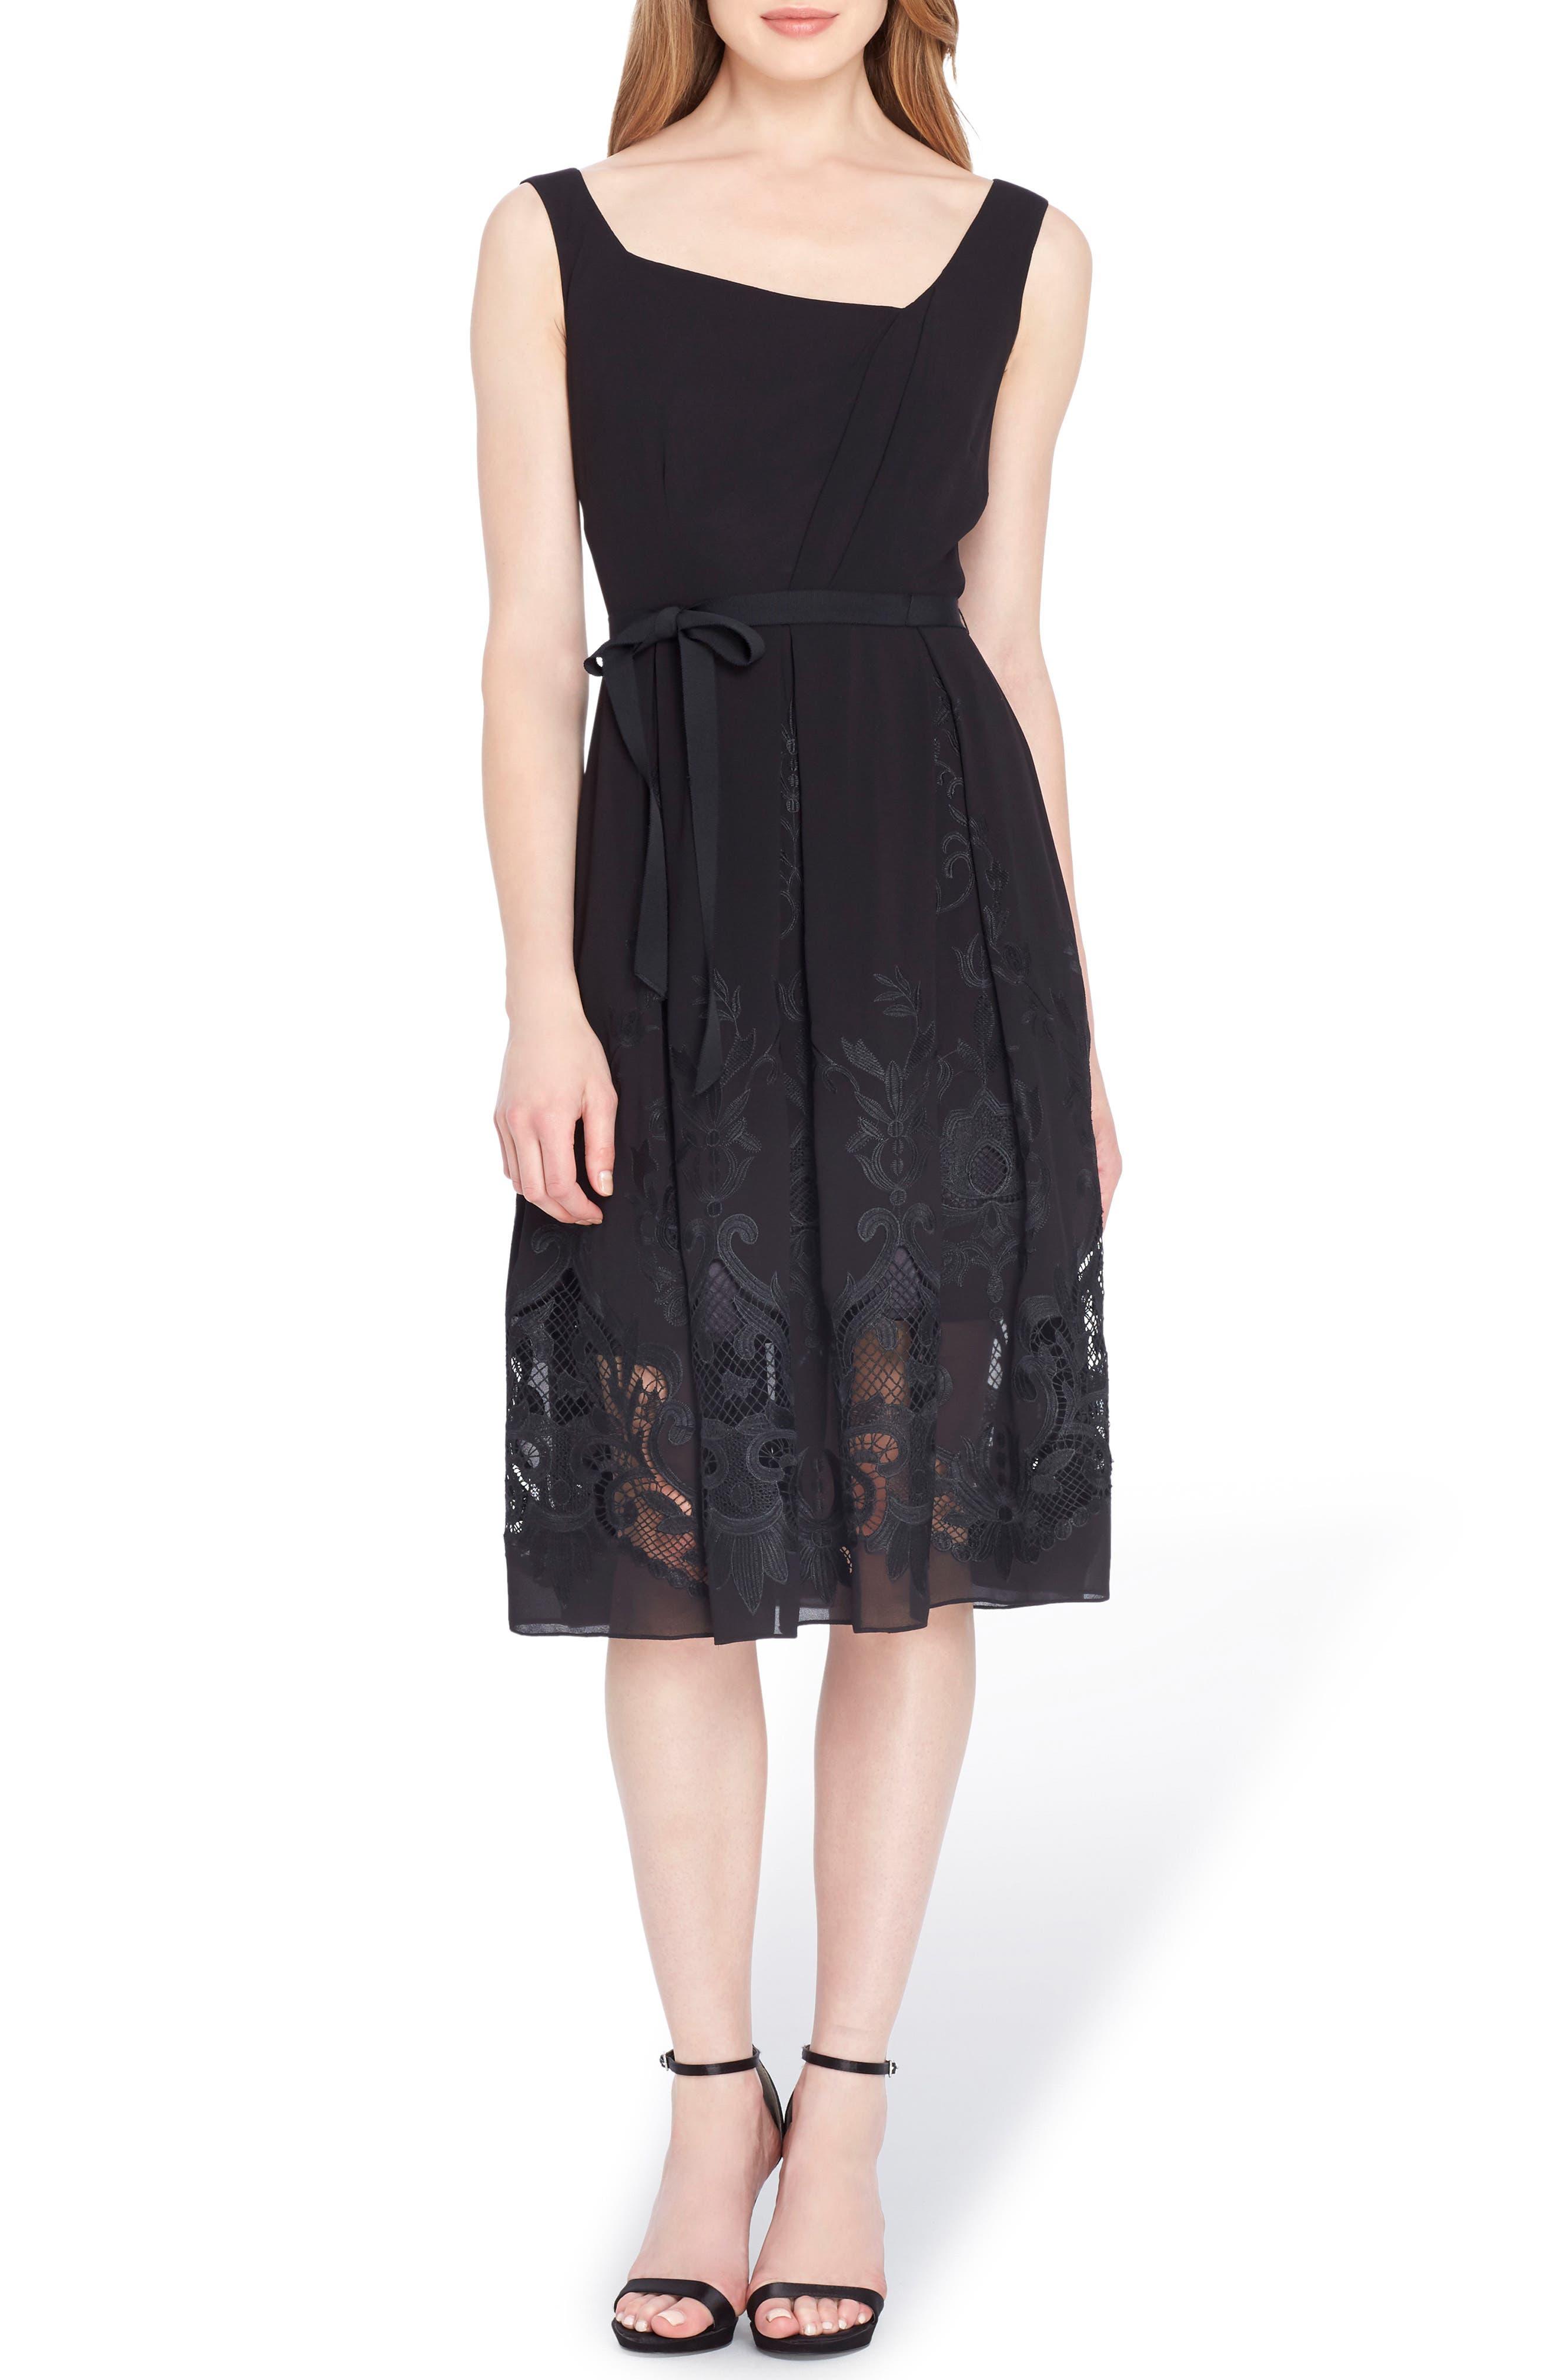 Alternate Image 1 Selected - Tahari Lace Fit & Flare Dress